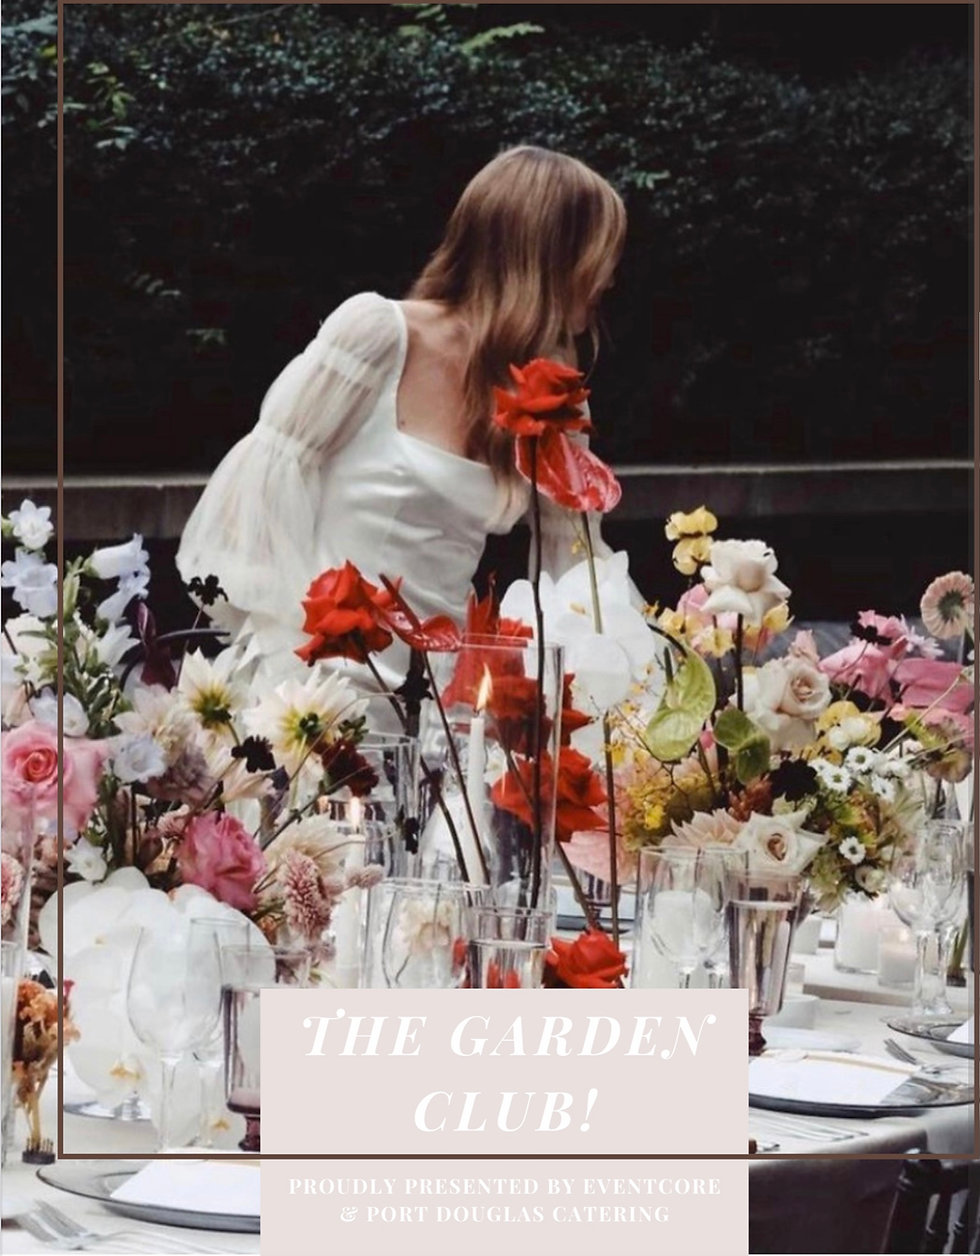 The garden club.jpg